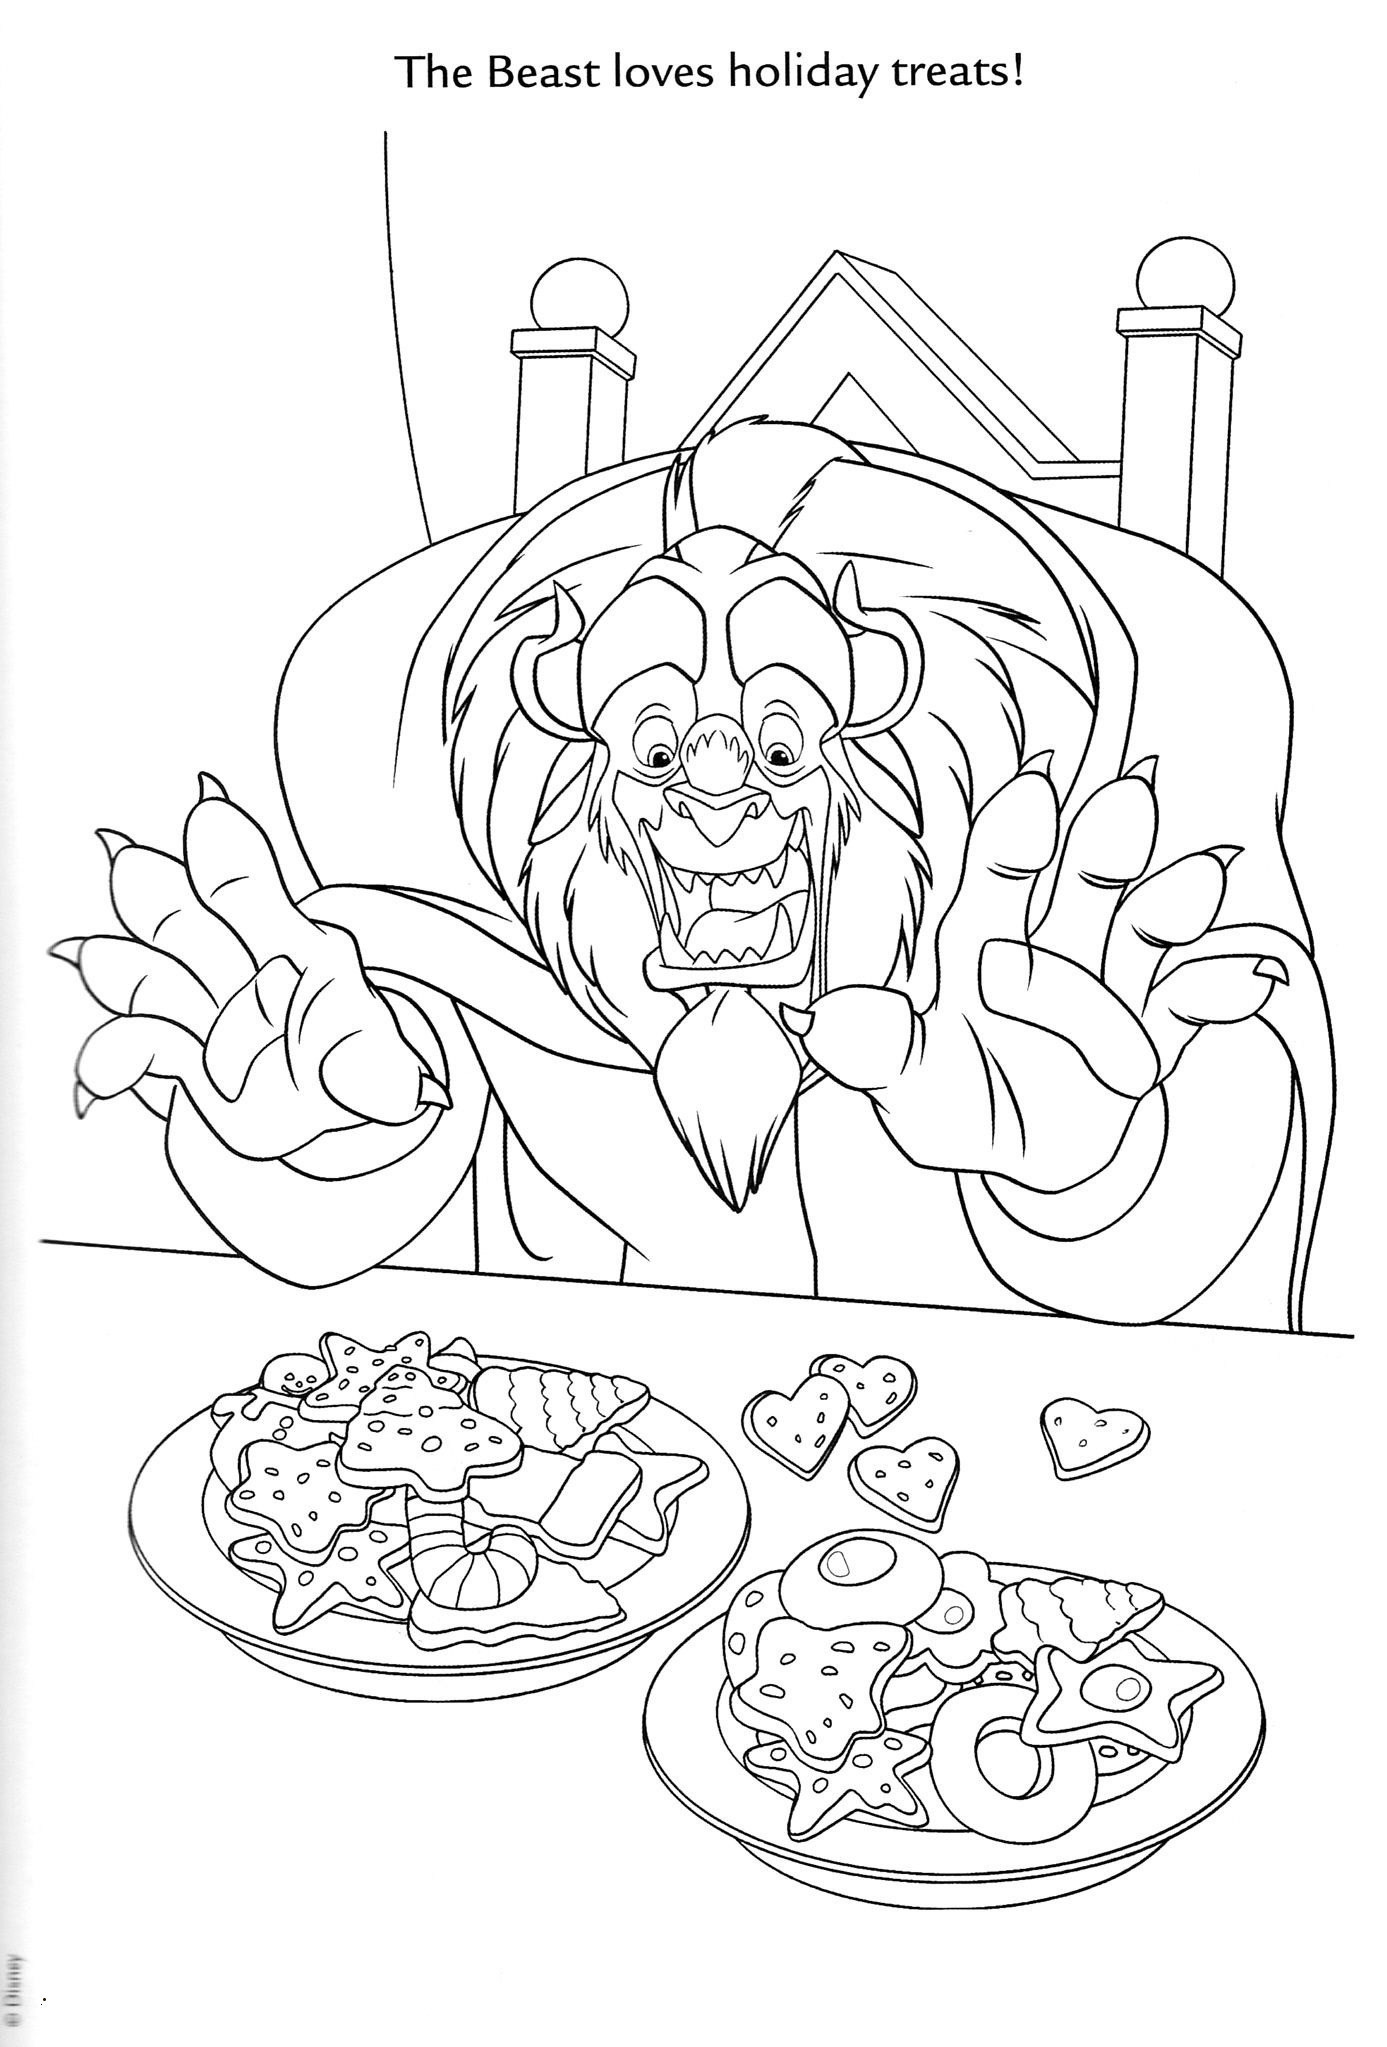 Mandala Herbst Zum Ausdrucken Neu Mandalas Ausmalbilder Frisch Mandala Coloring Worksheet Mandalas Bild